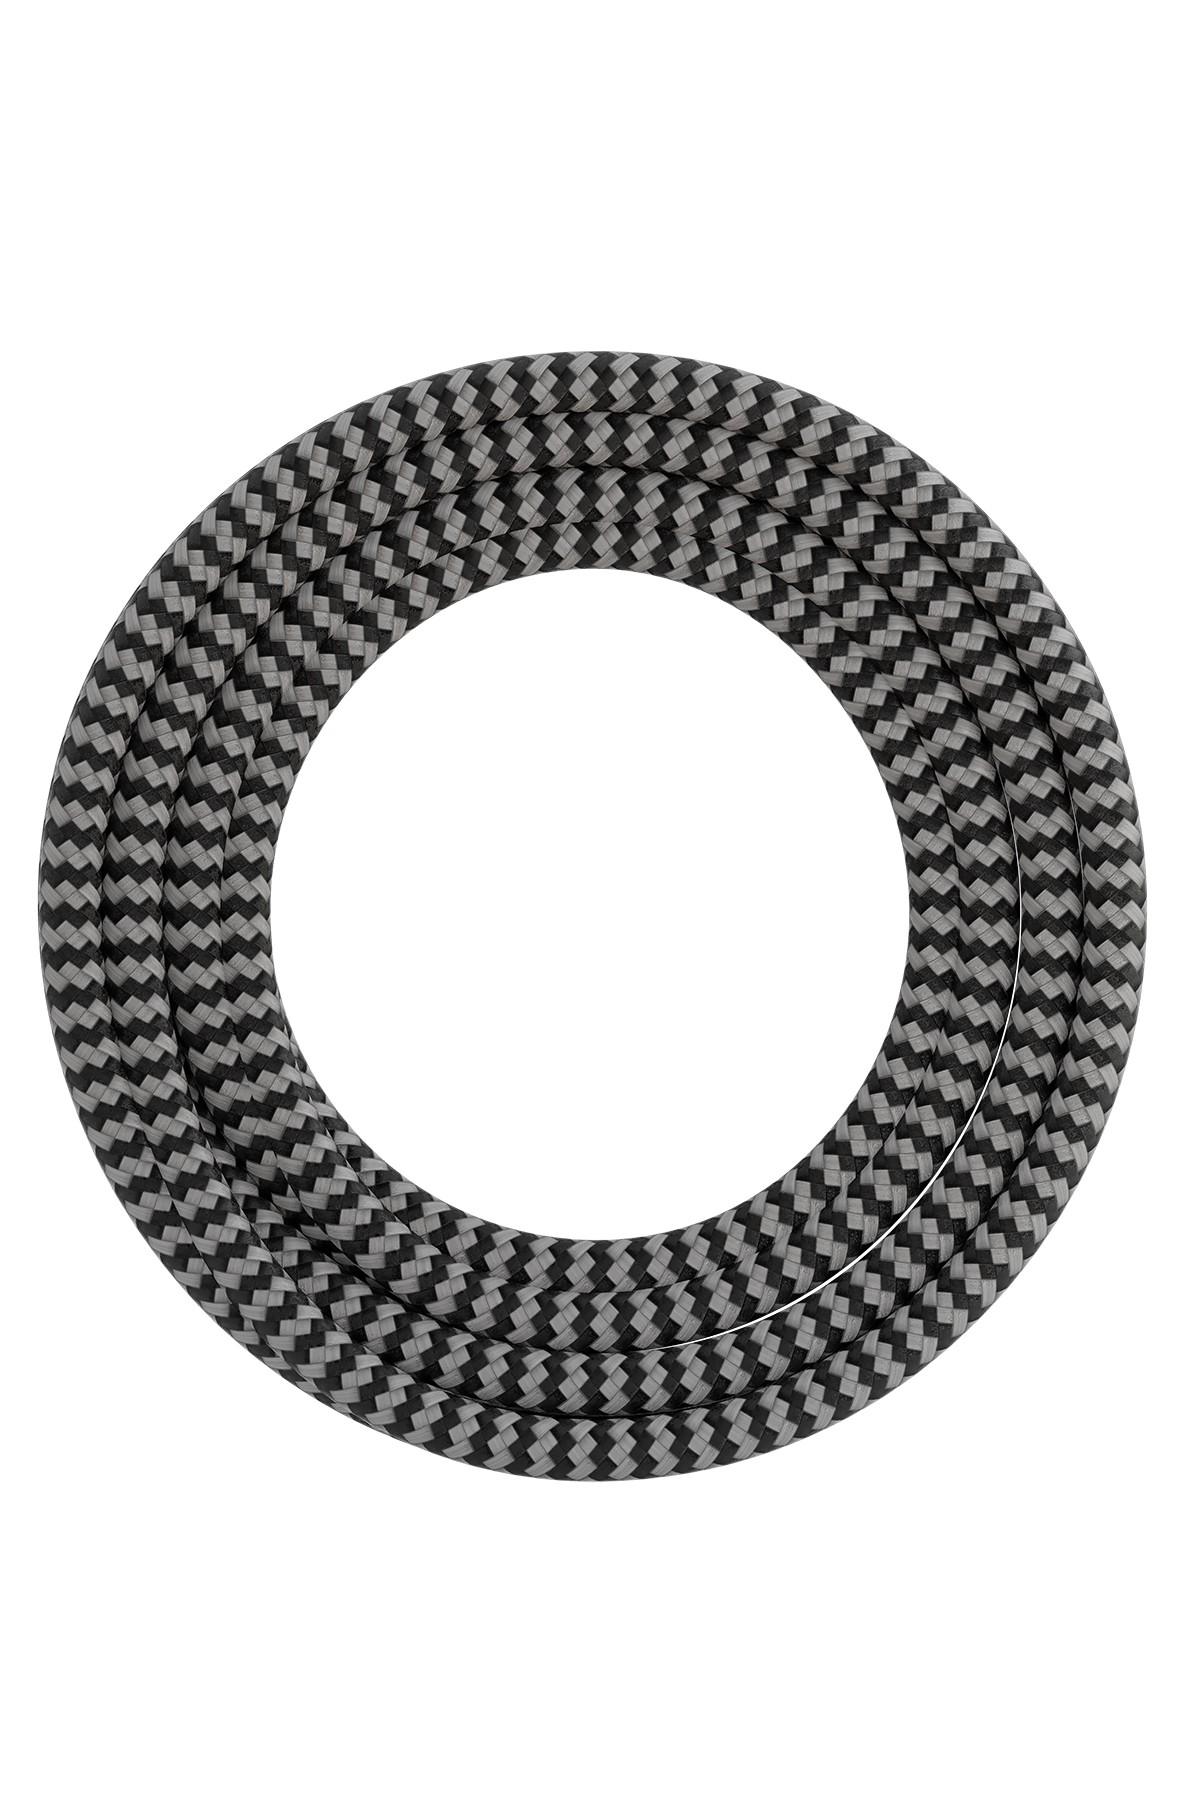 Calex textiel omwikkelde kabel 2x0,75mm2 1,5M zwart/wit, max.250V-60W